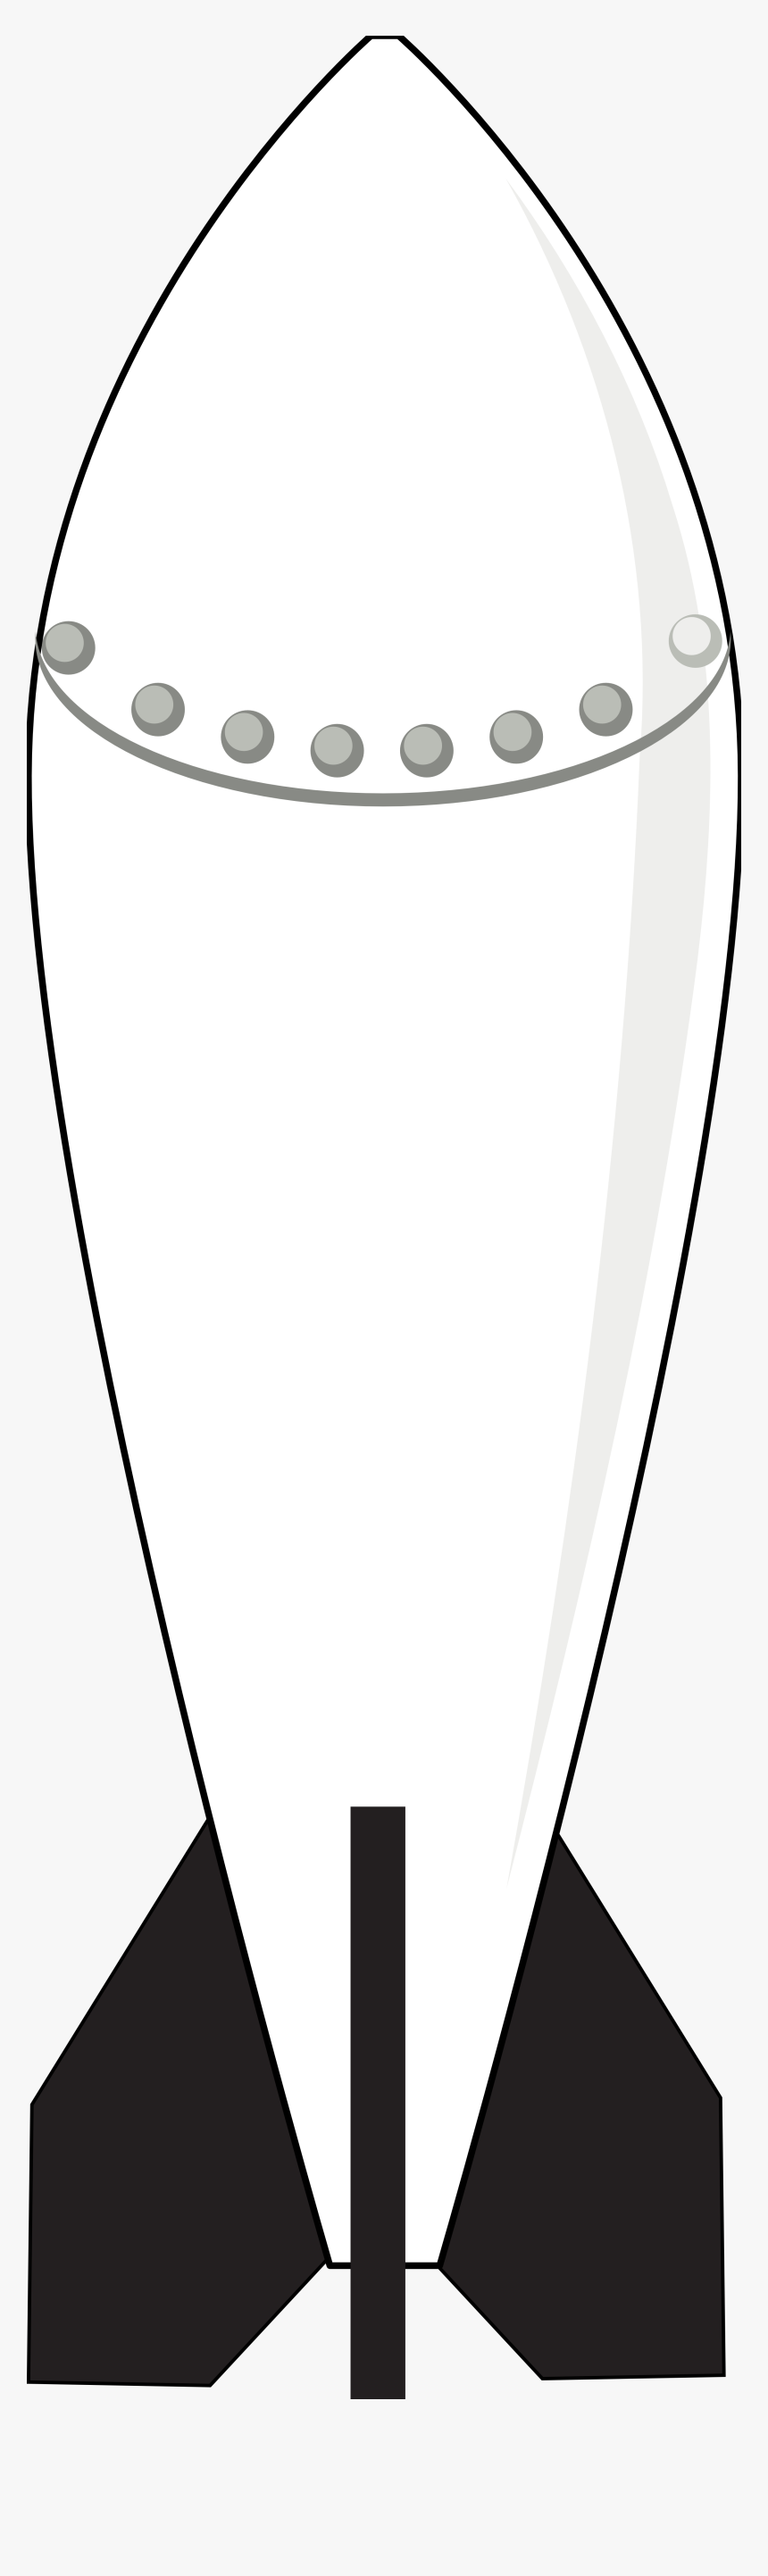 Clip Art Cartoon Bomb Clipart Nuclear Bomb Coloring Pages Hd Png Download Transparent Png Image Pngitem